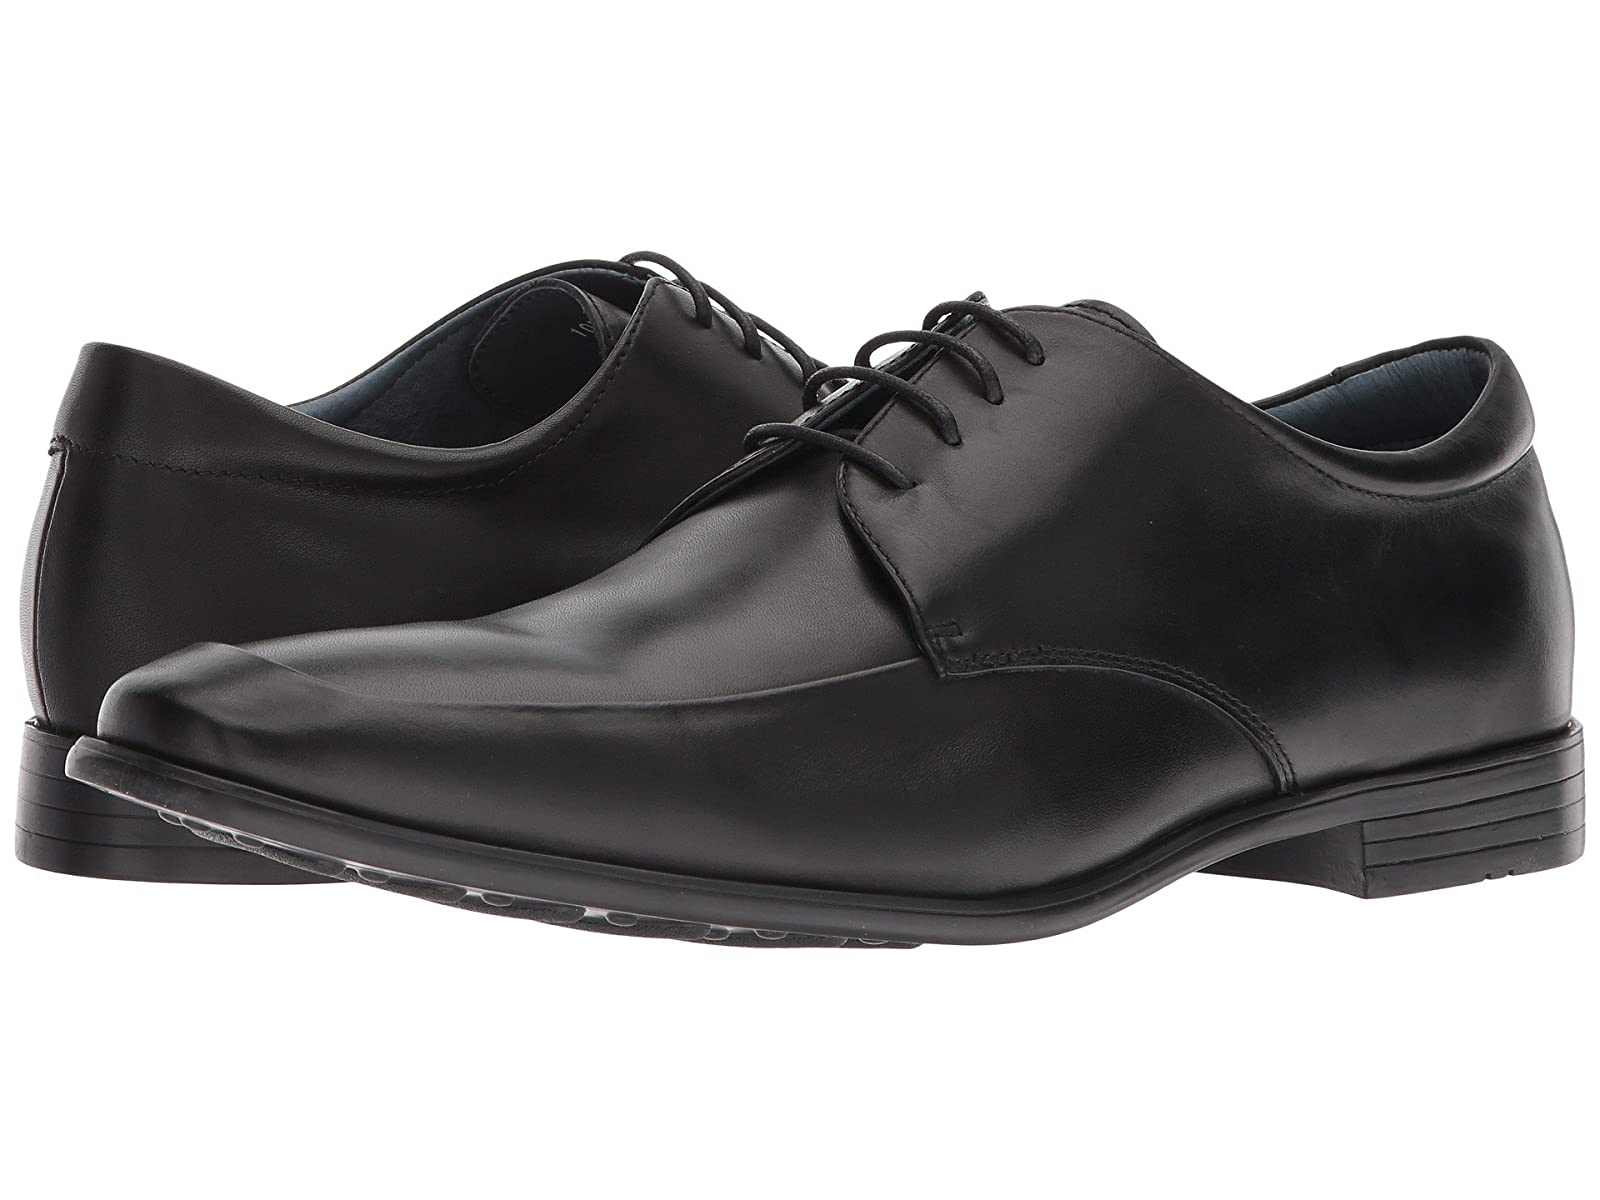 RUSH by Gordon Rush TinsleyAtmospheric grades have affordable shoes